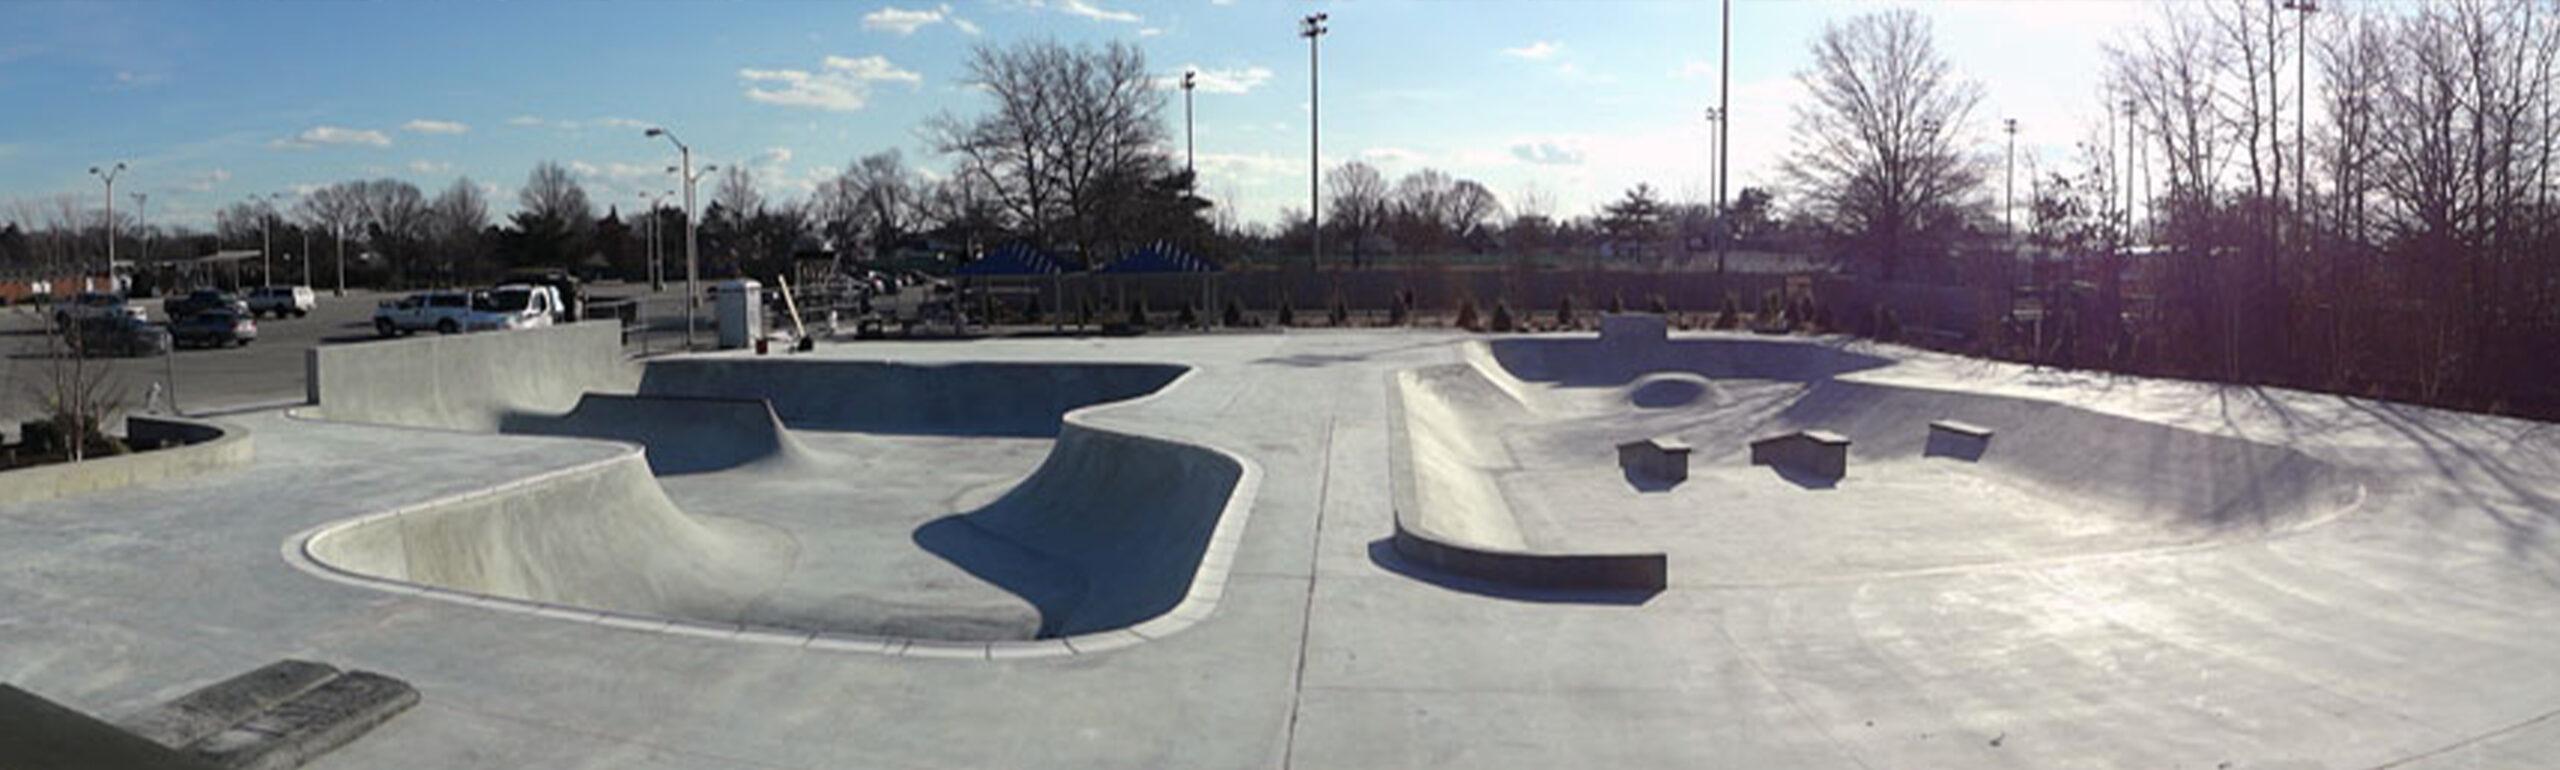 Bethpage Skate Park